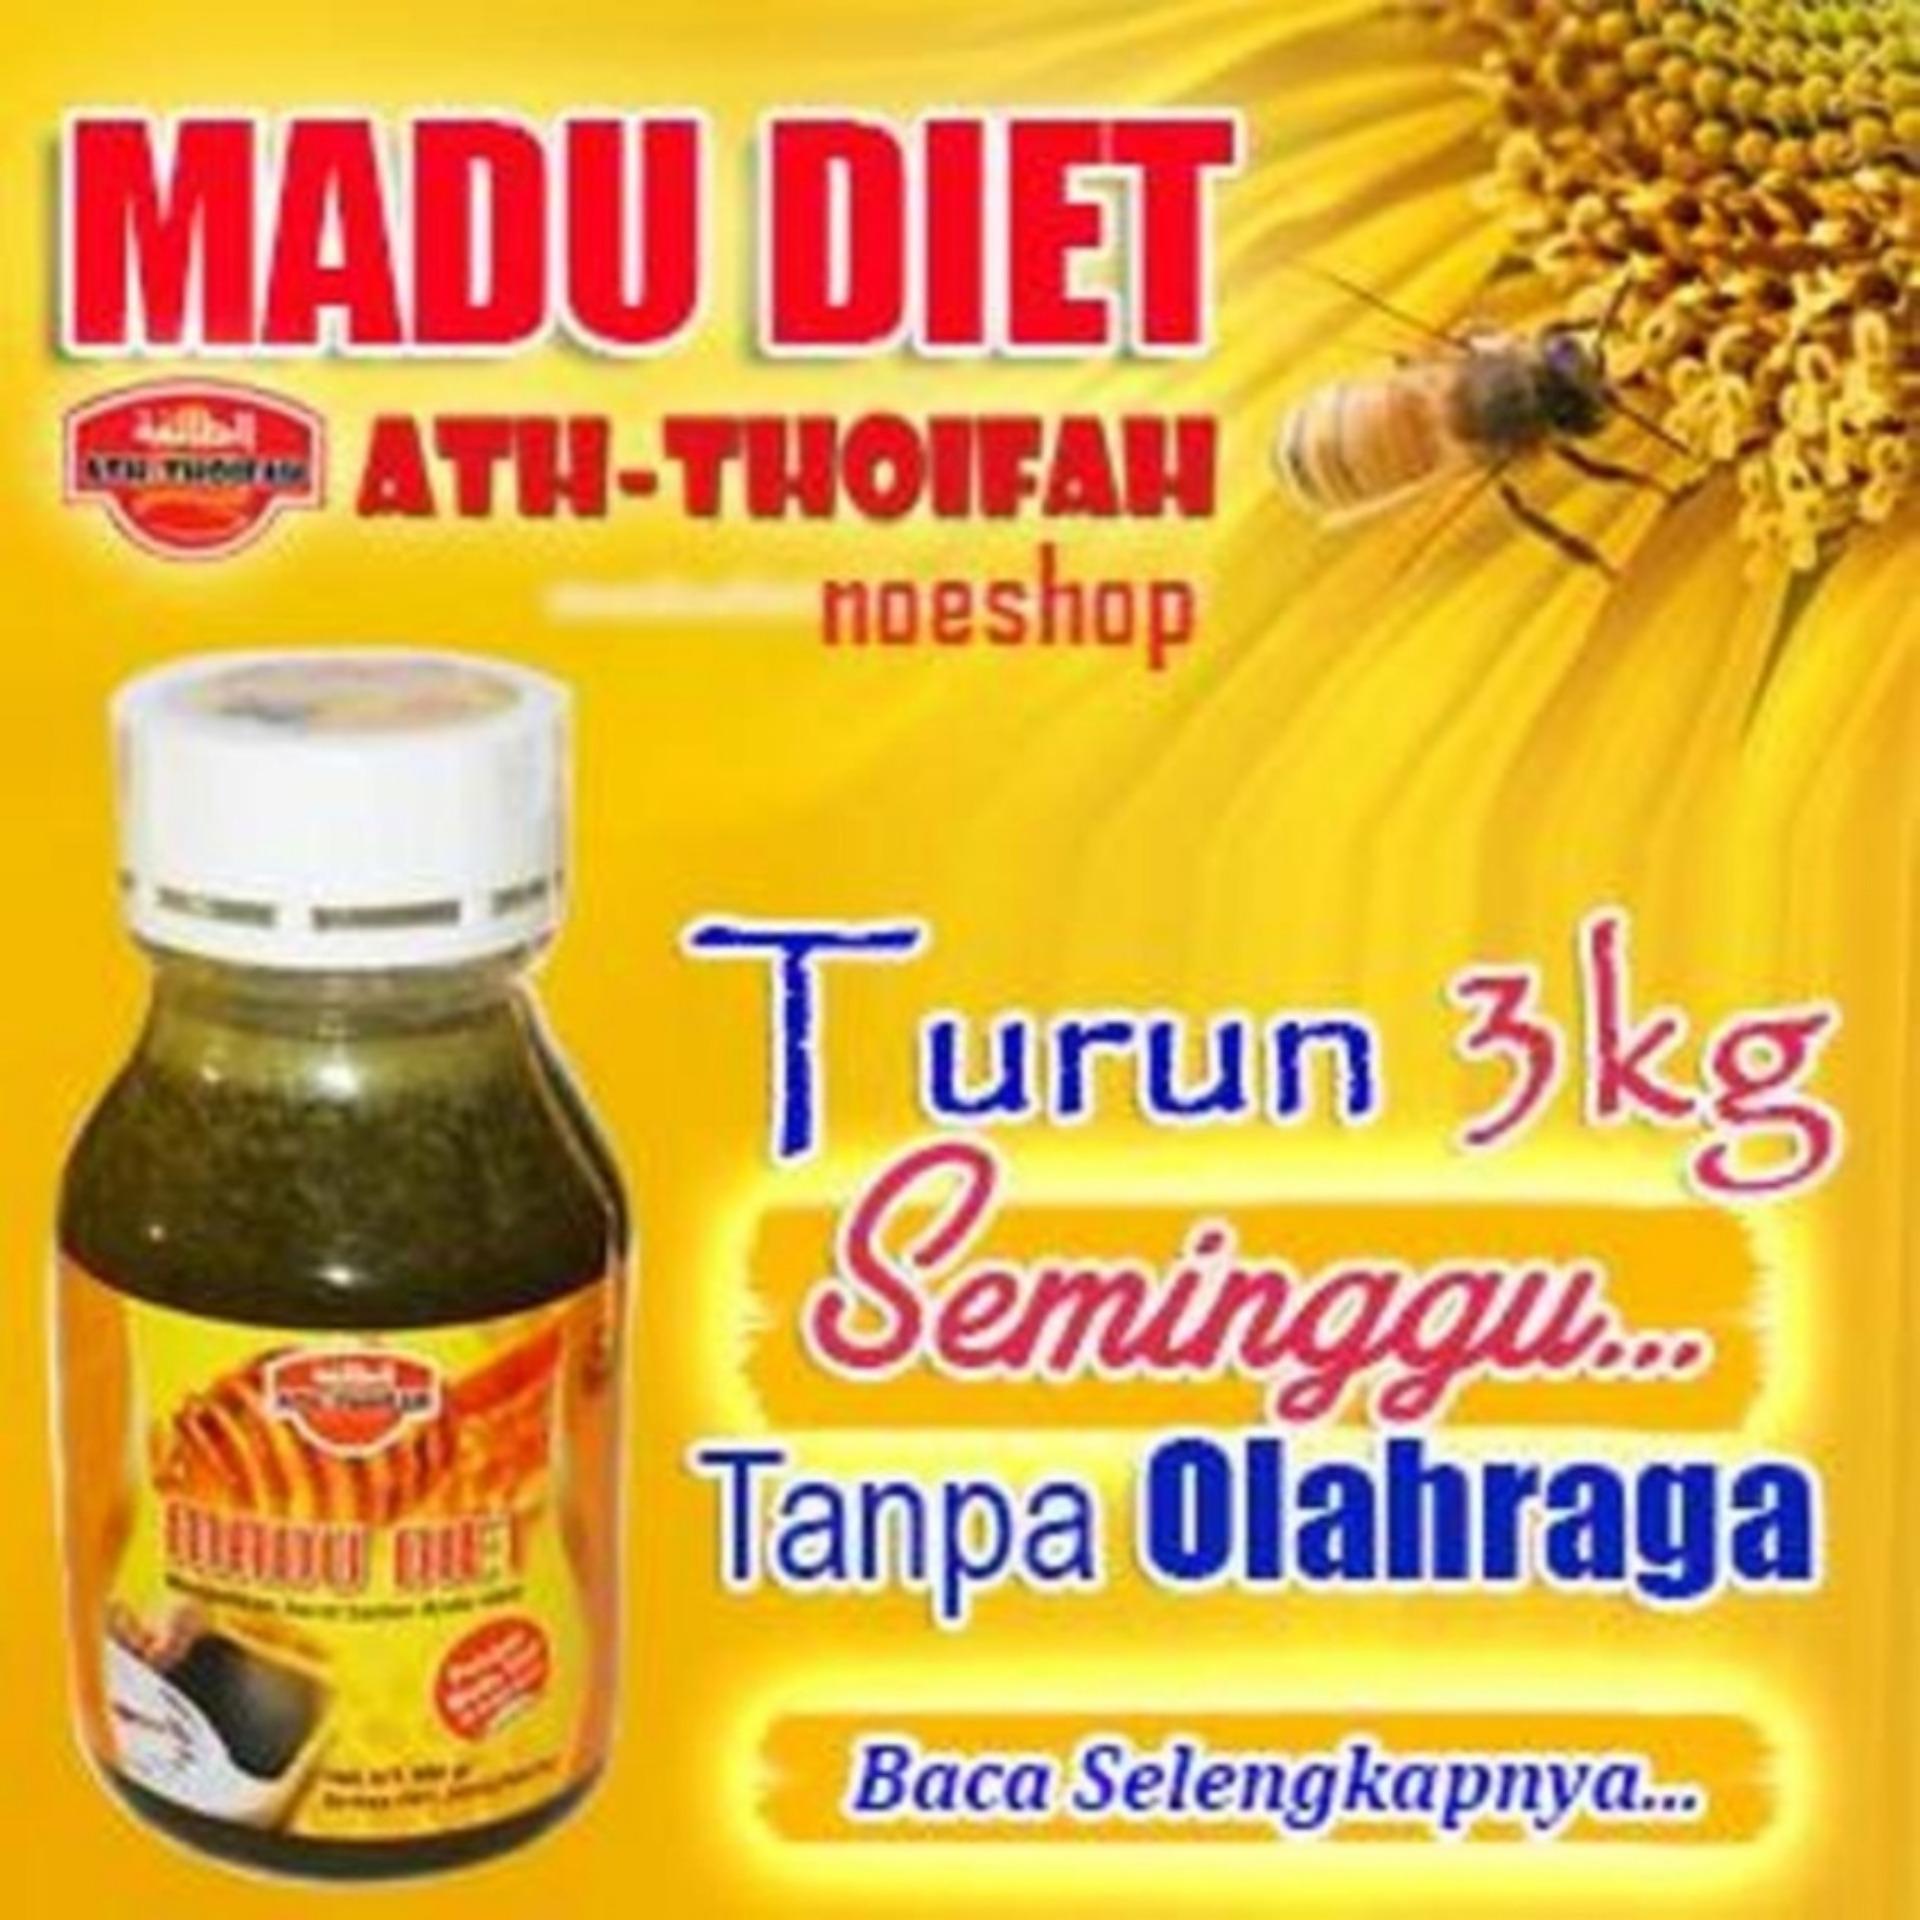 TERLARIS !!! Madu Diet Pelangsing Ath-Thoifah Original Asli ObatHerbal Langsing Detox Sehat